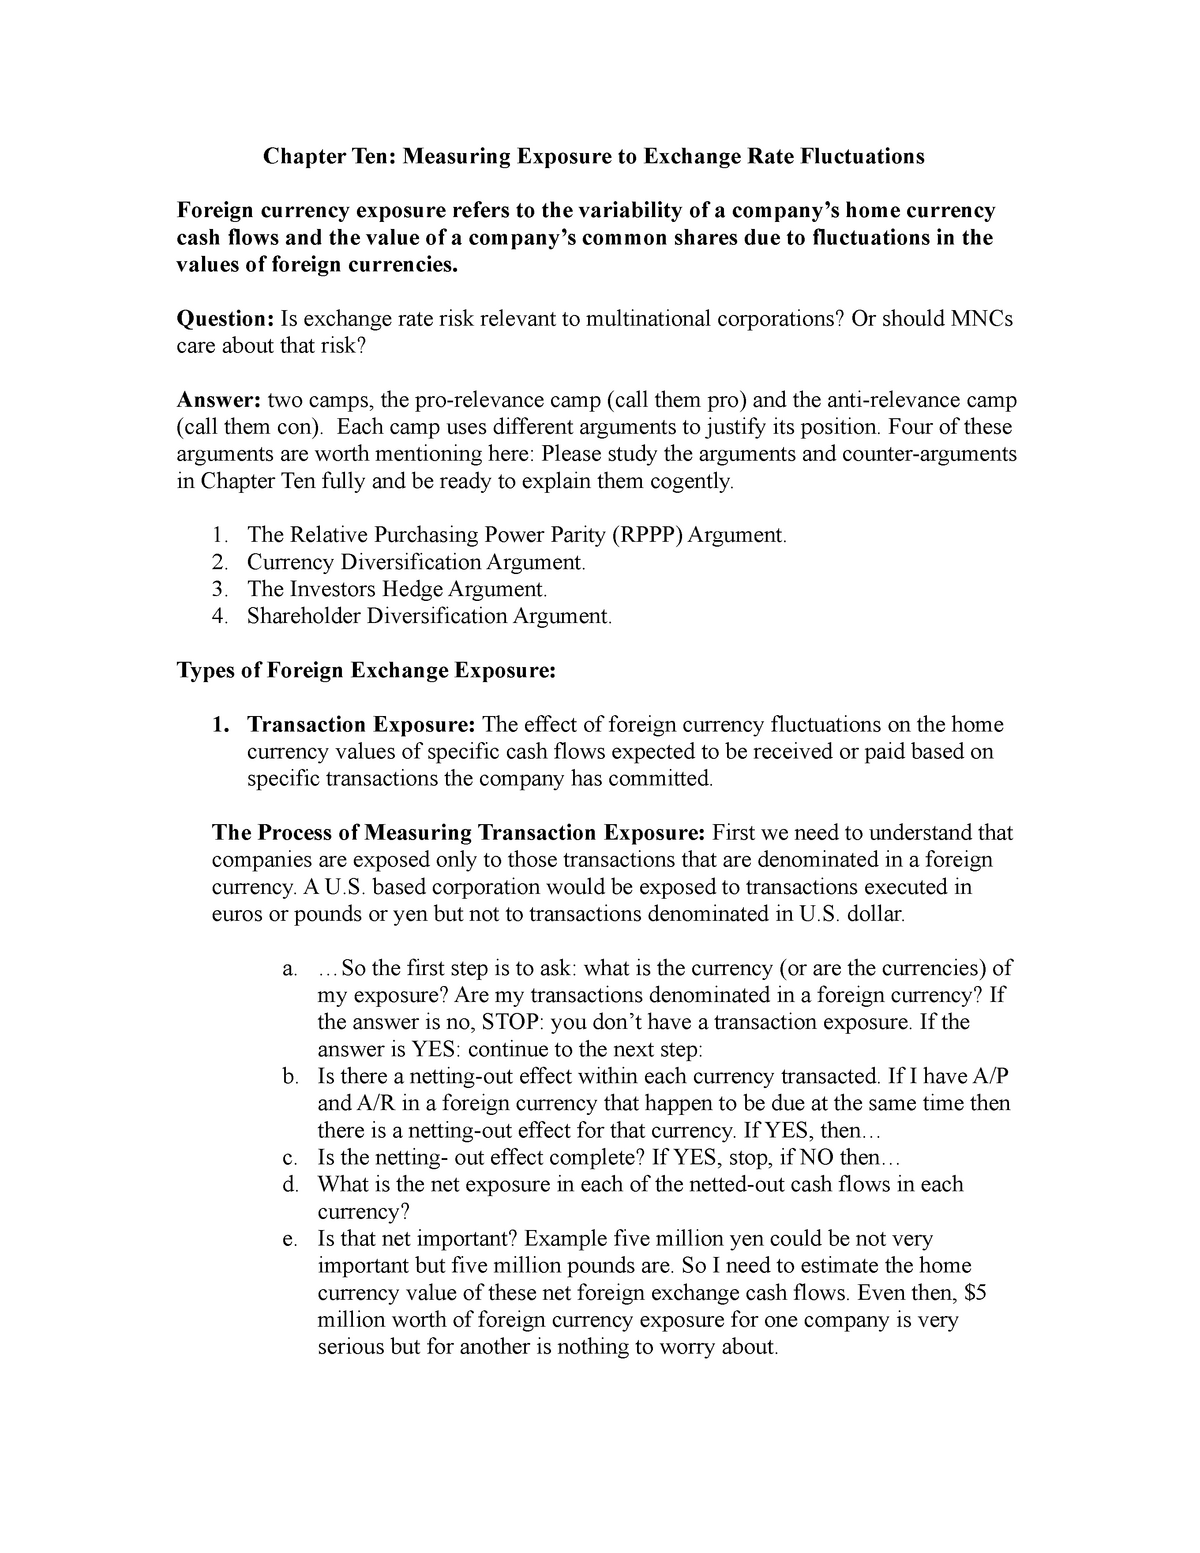 Chapter Ten Summary Measuring Exposure to Exchange Rate